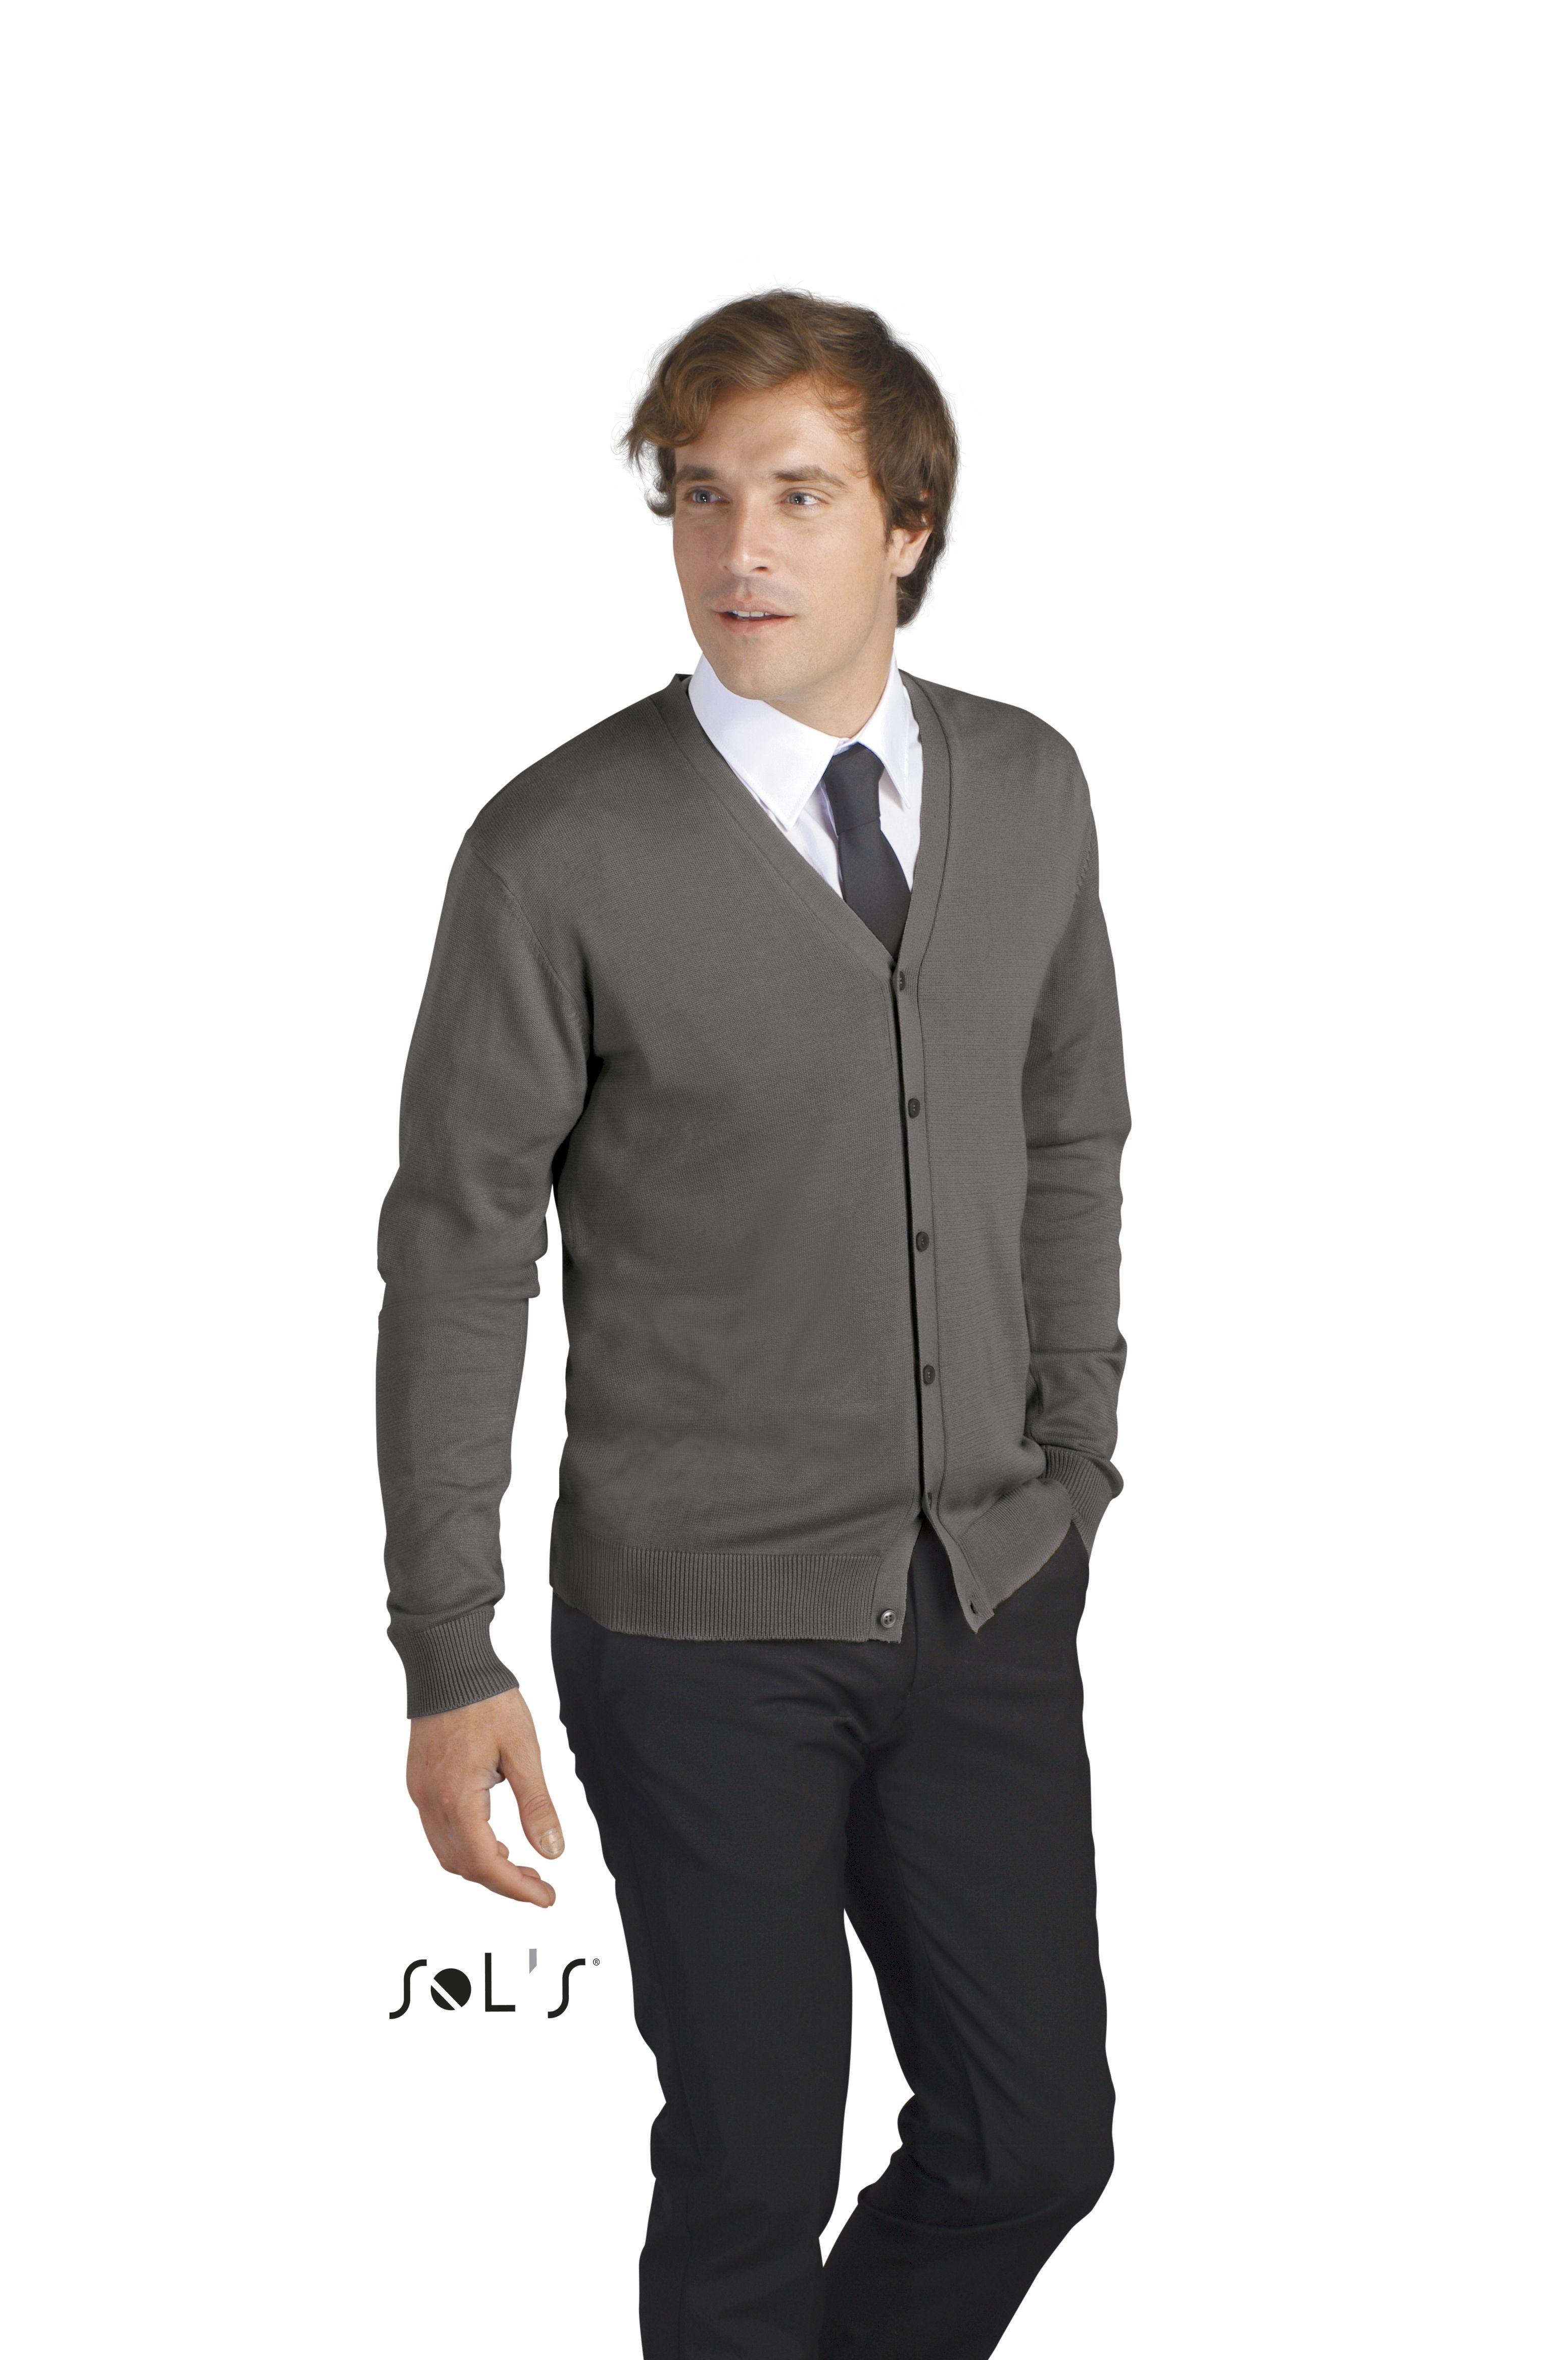 Sweter S 90011 Golden Men - 90011_medium grey_S - Kolor: Medium grey